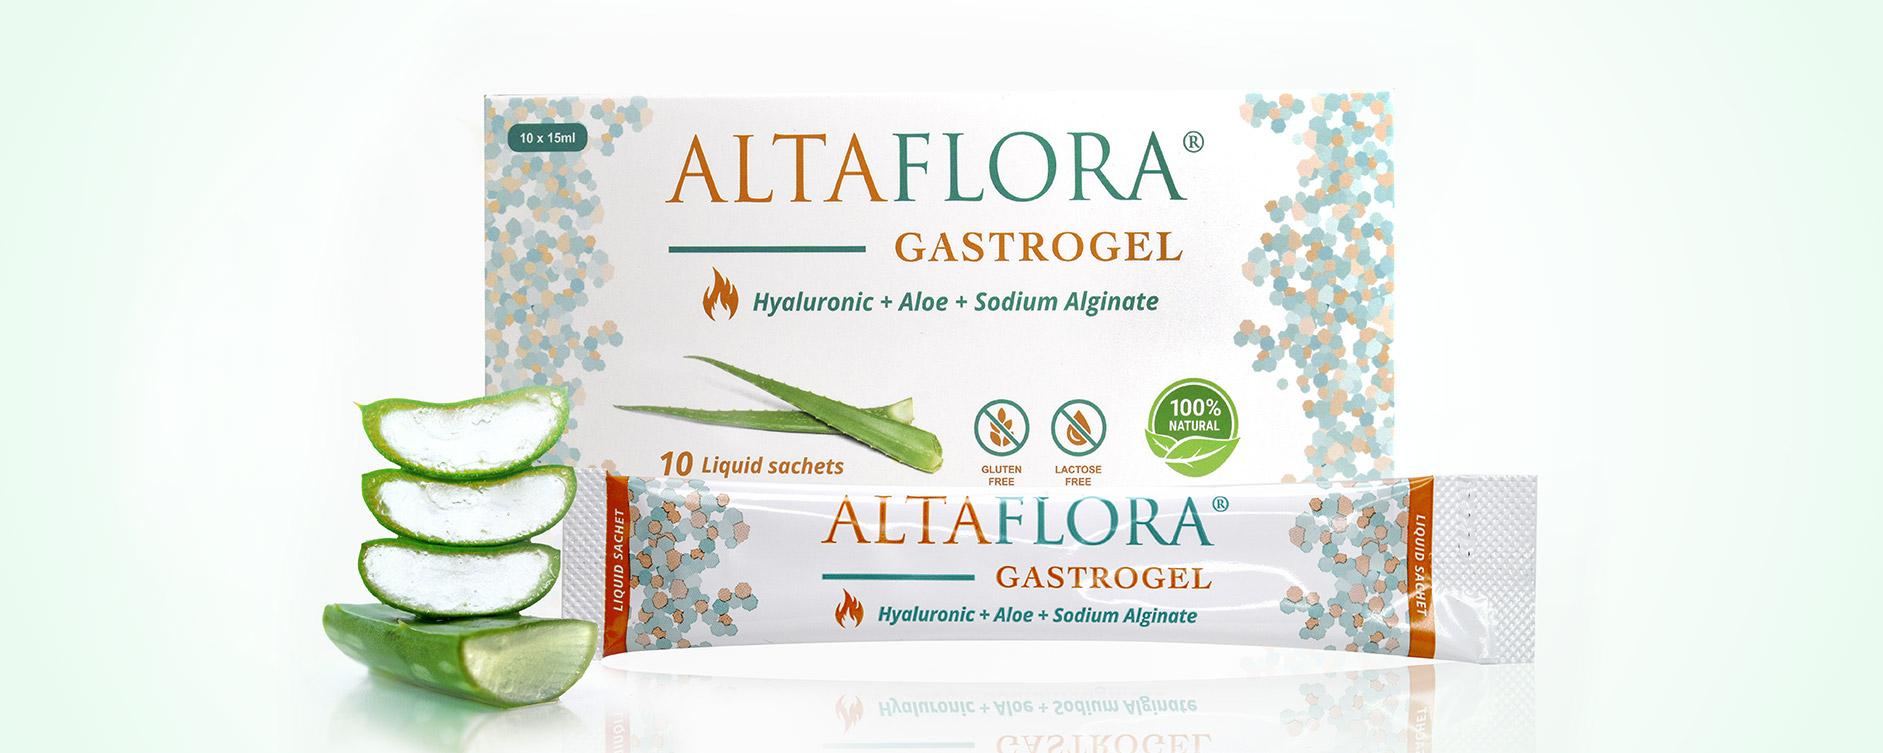 ALTAFLORA – GASTRO-INTESTINALE